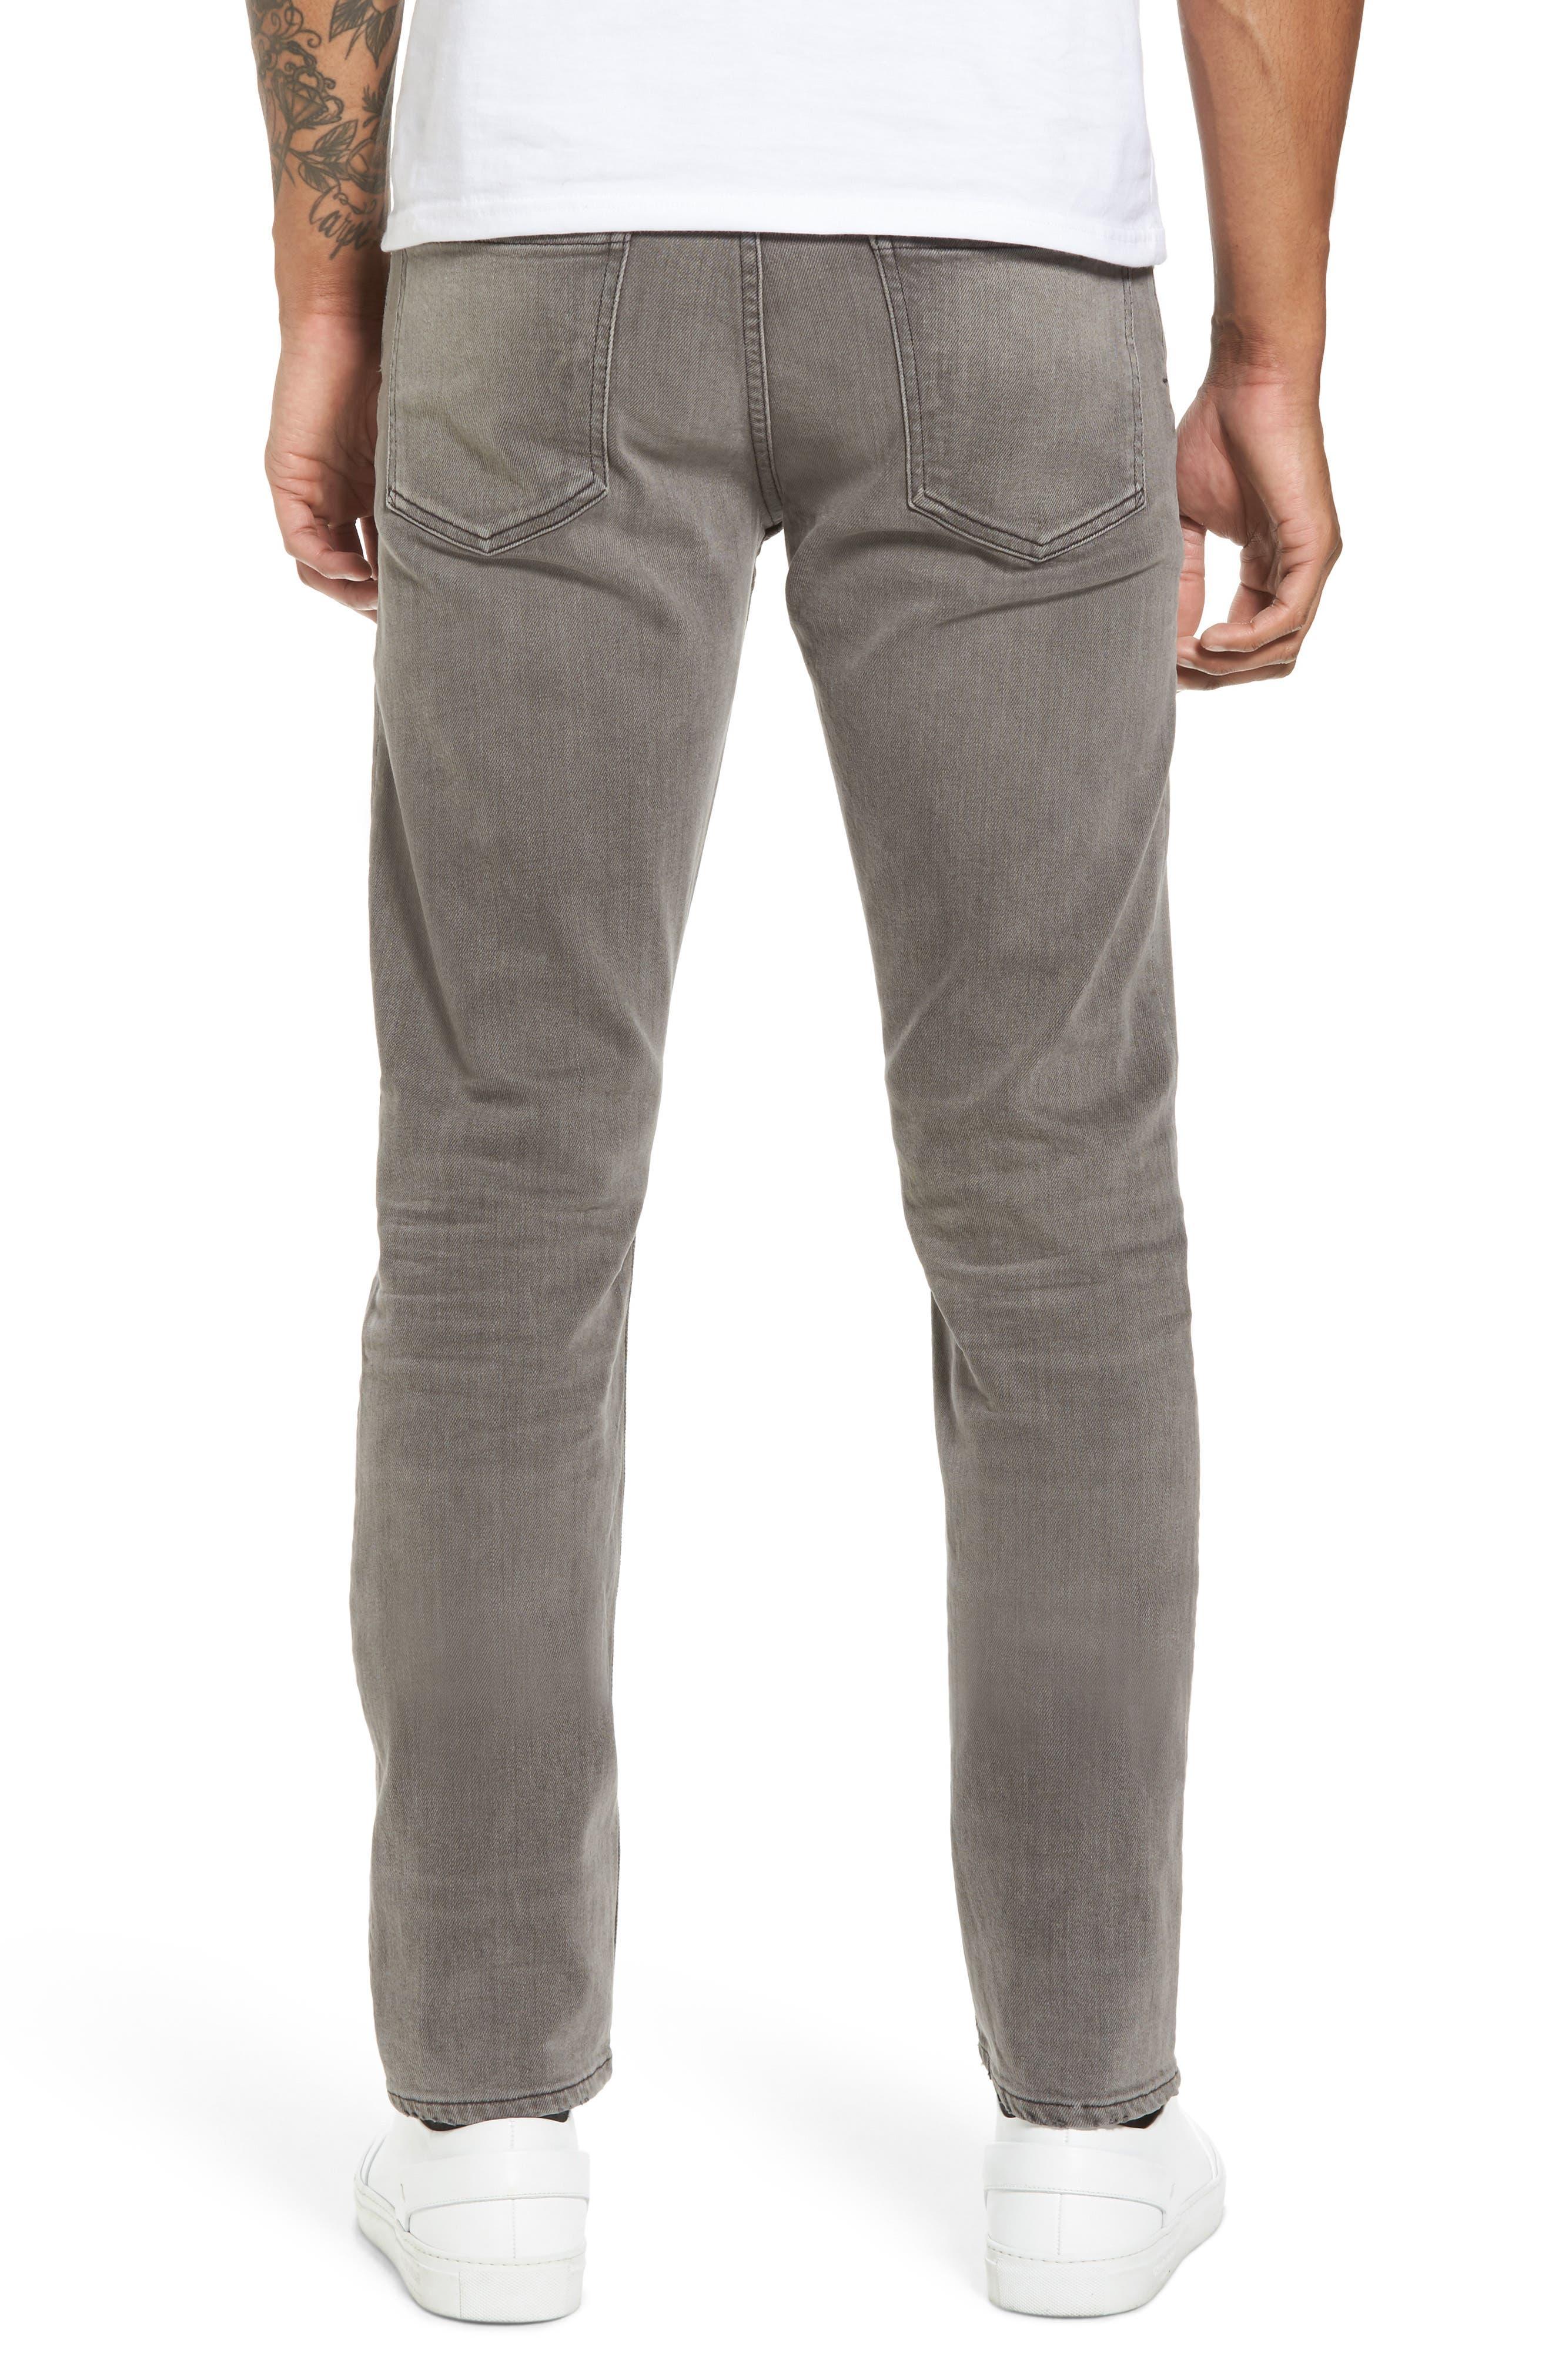 Bowery Slim Fit Jeans,                             Alternate thumbnail 2, color,                             Leon